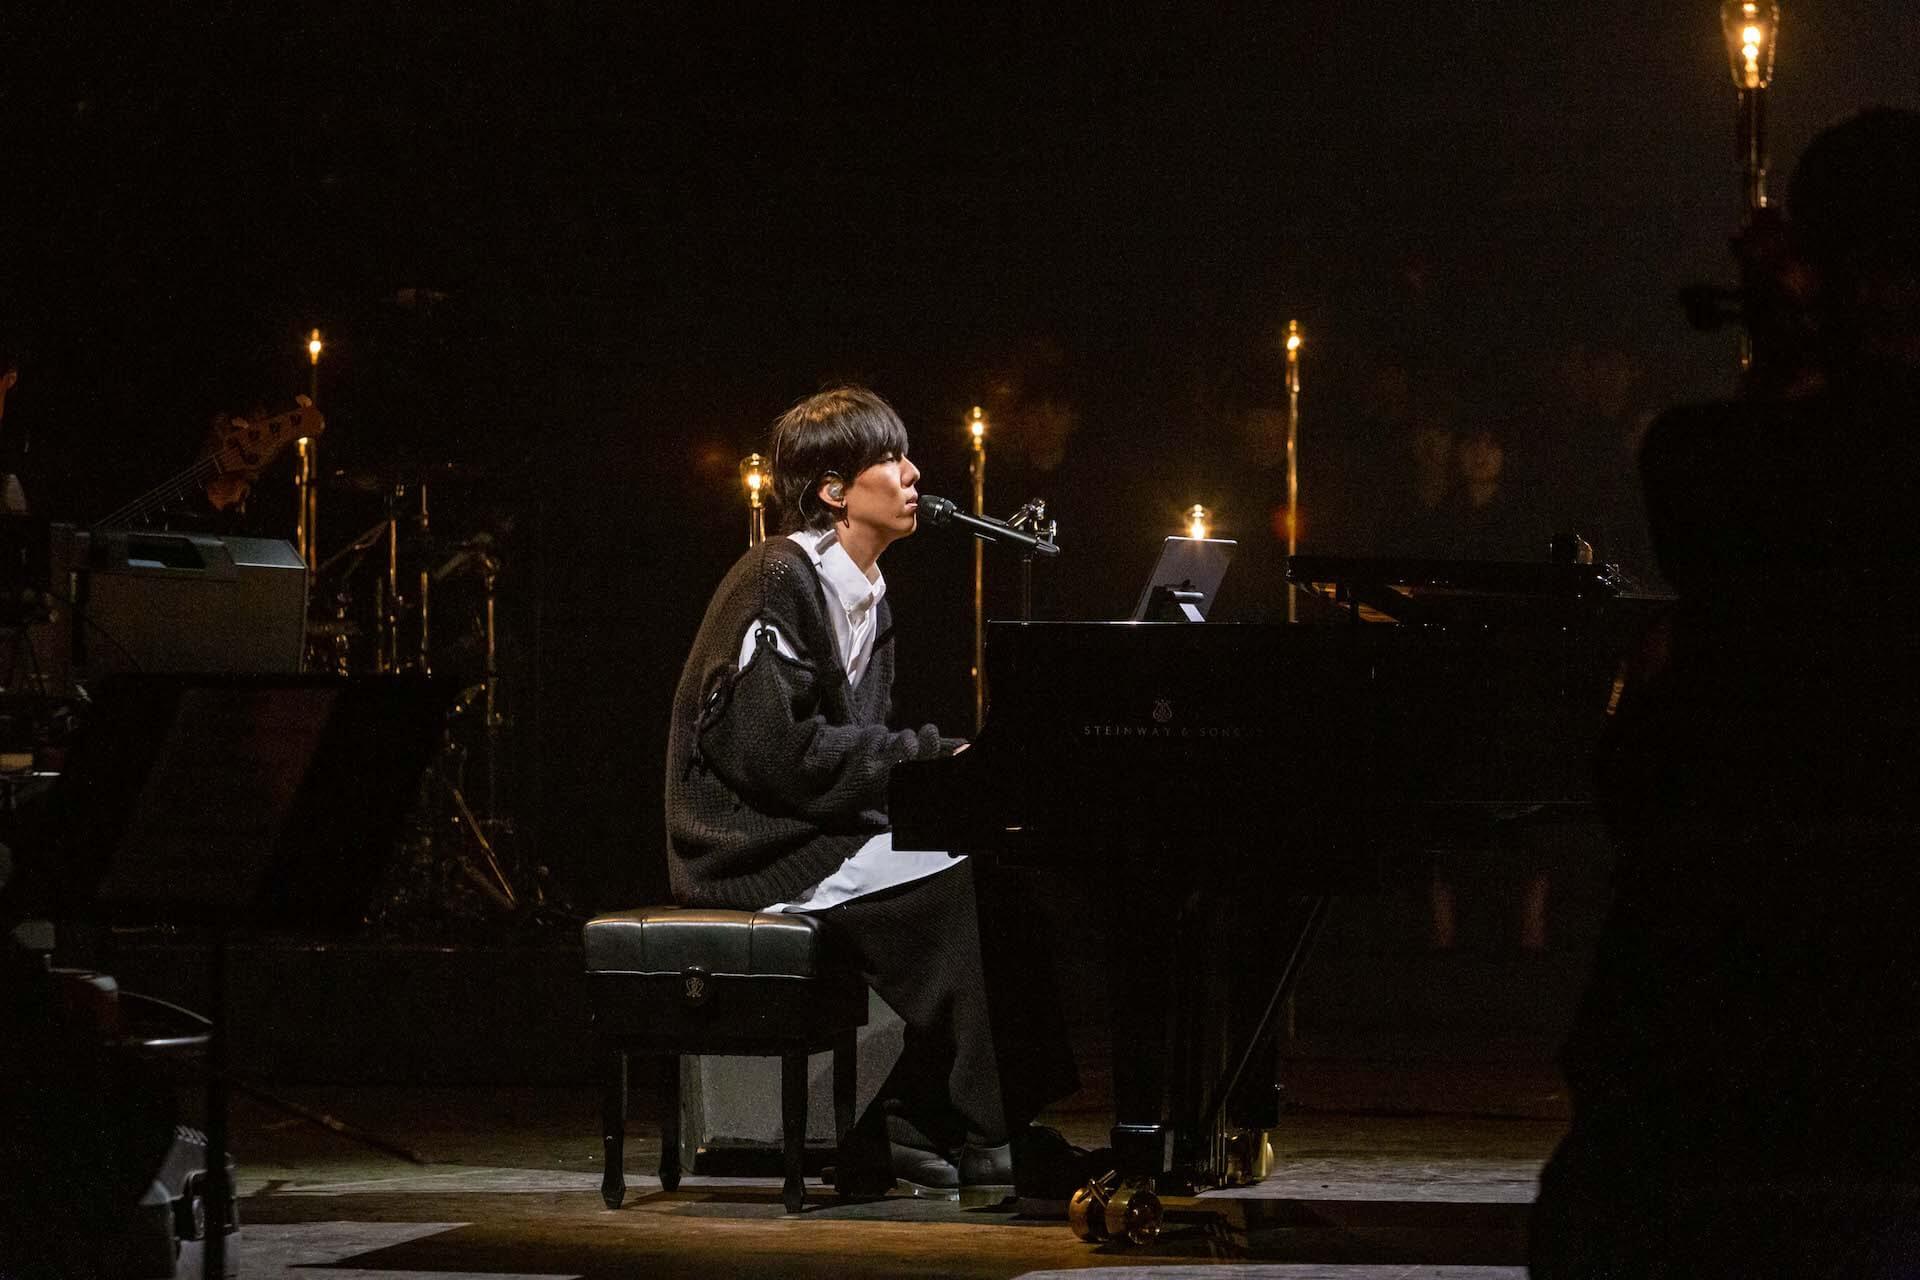 RADWIMPS、NHK総合にて「天気の子」特集番組の放送が決定!4曲のパフォーマンスを披露 art191023_radwimps_nhk_3